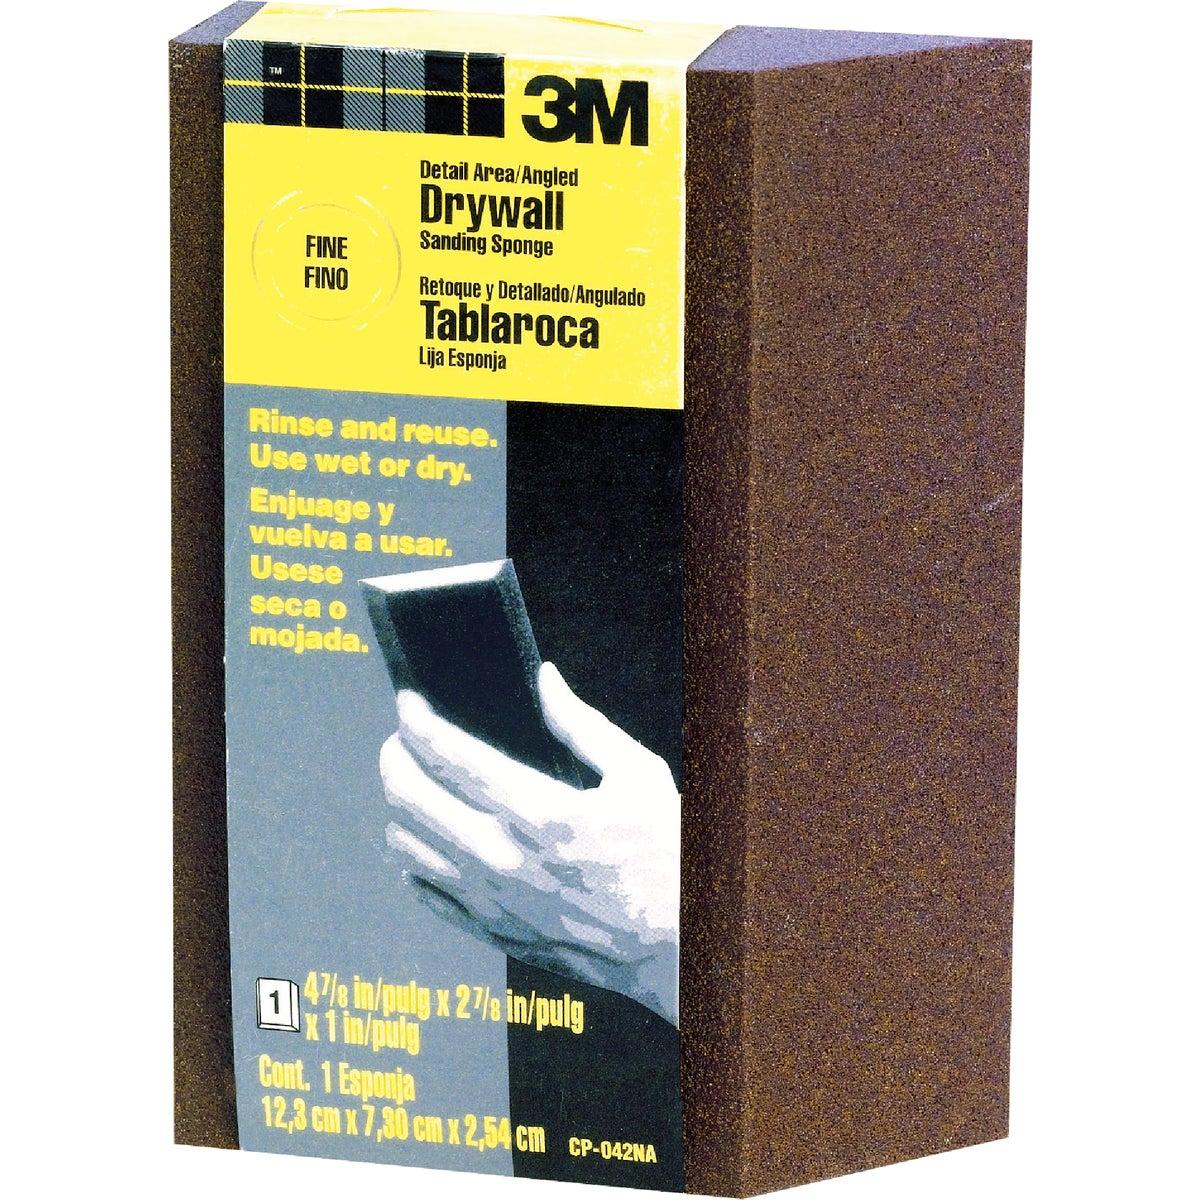 3M Angled Detail Area Drywall 2-7/8 In. x 4-7/8 In. x 1 In. Fine Sanding Sponge